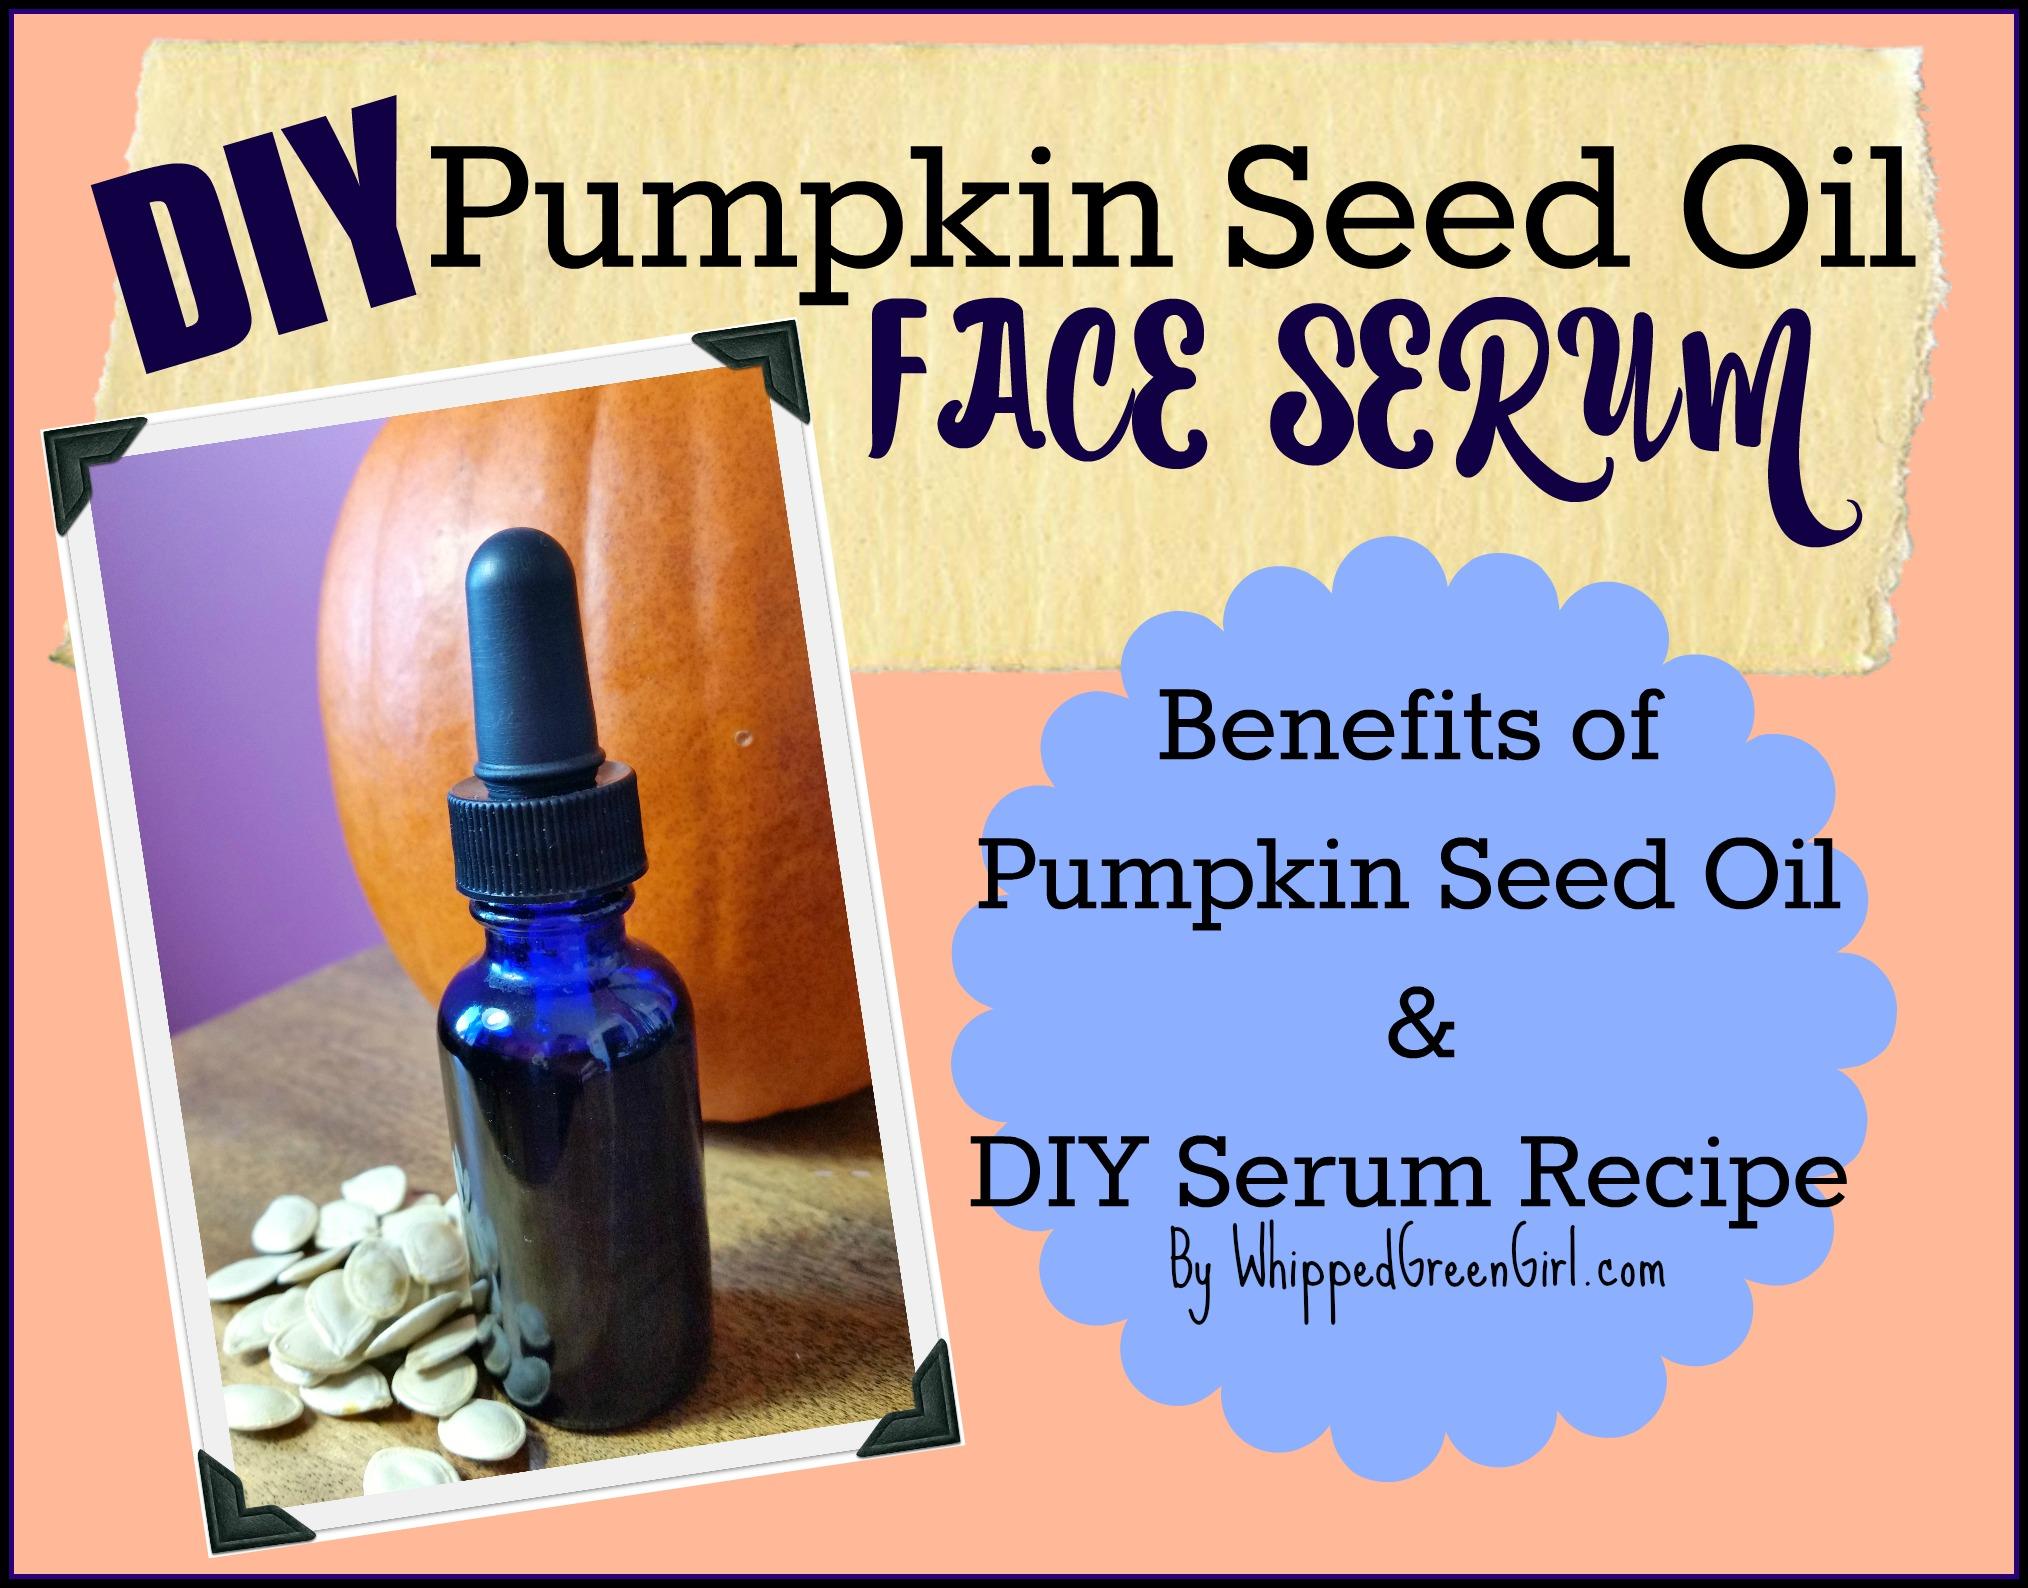 #DIY Pumpkin Seed Oil Face Serum (Benefits of Pumpkin Seed Oil) By WhippedGreenGirl.com